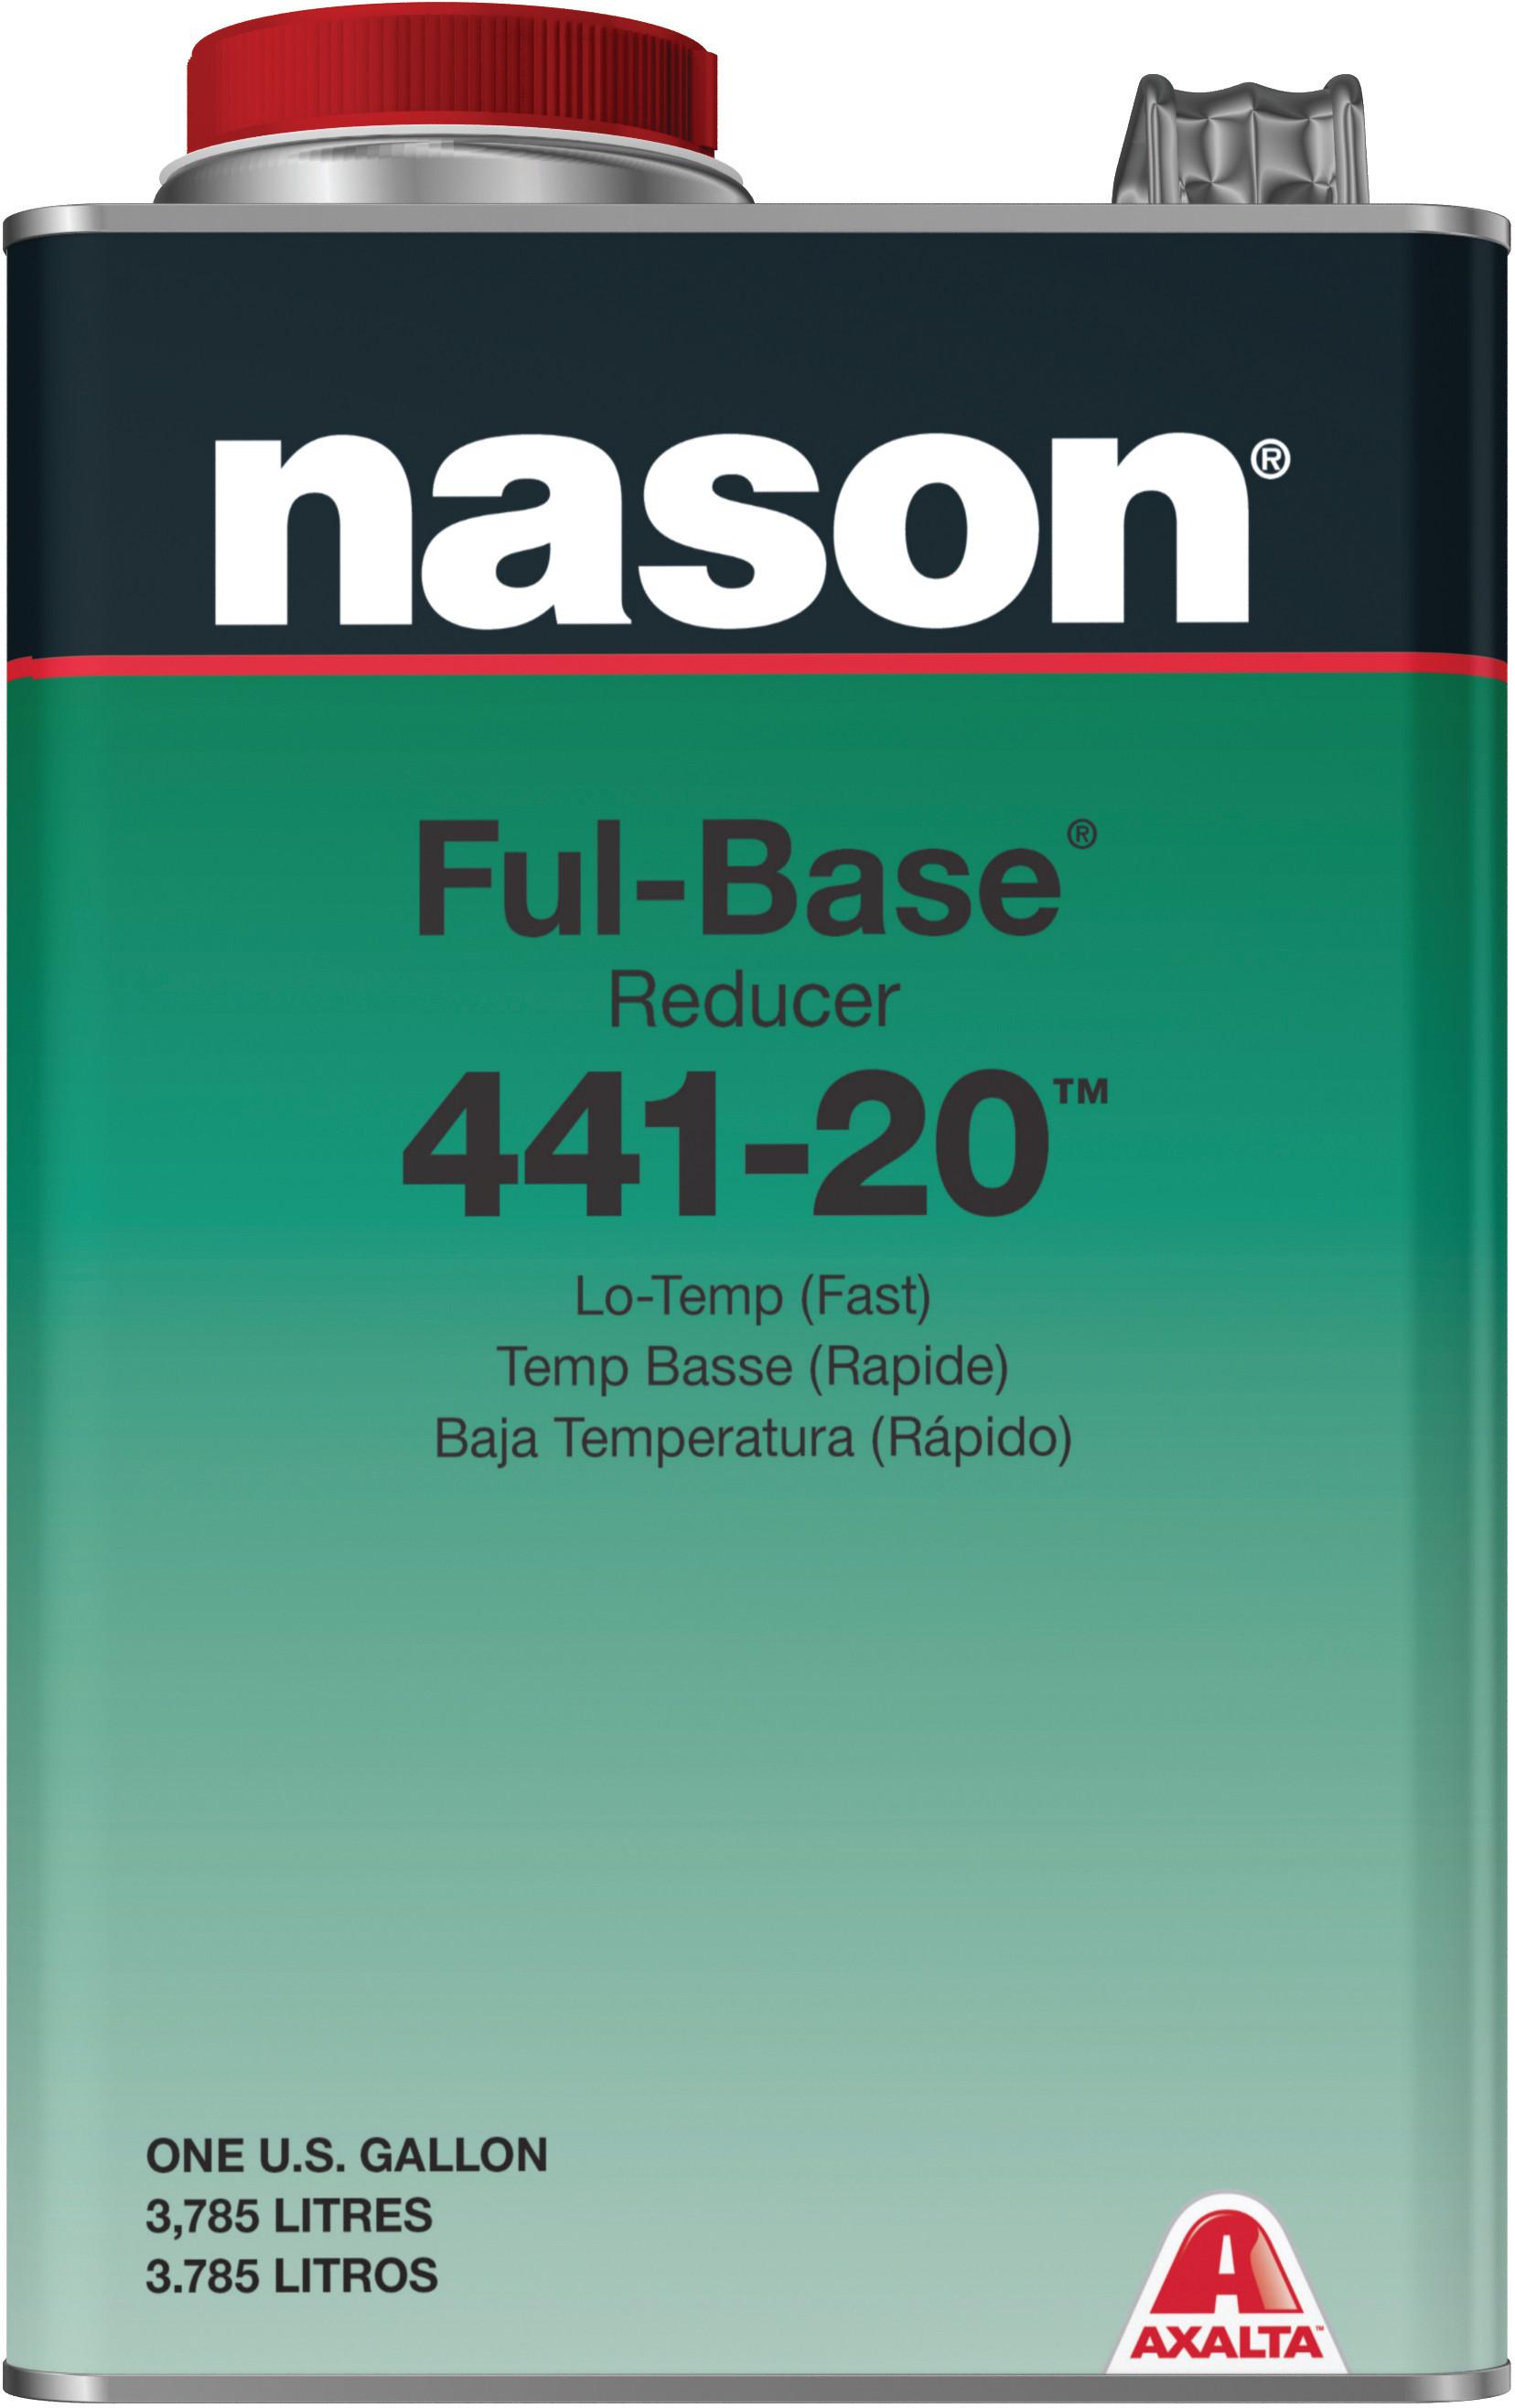 Axalta Nason FulBase Reducer 44120 Fast Gallon